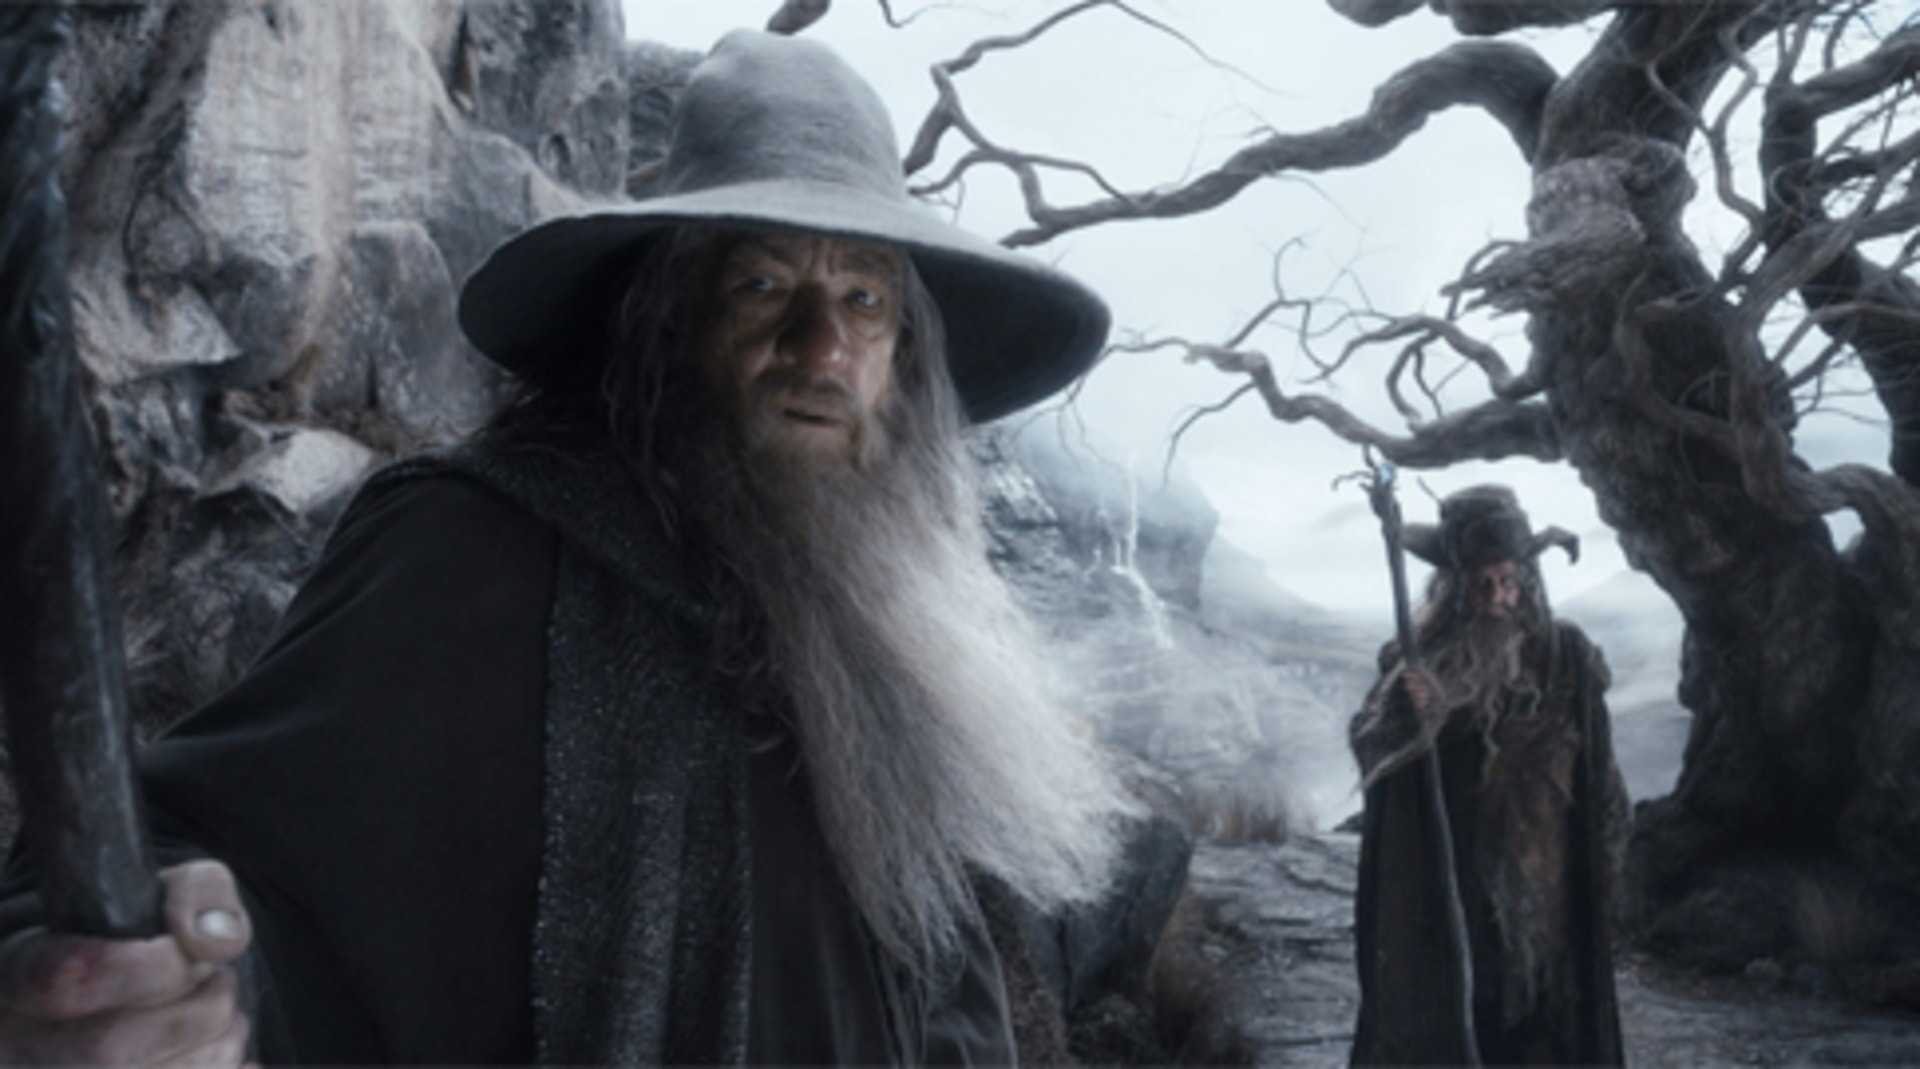 The Hobbit: The Desolation of Smaug - Image 16